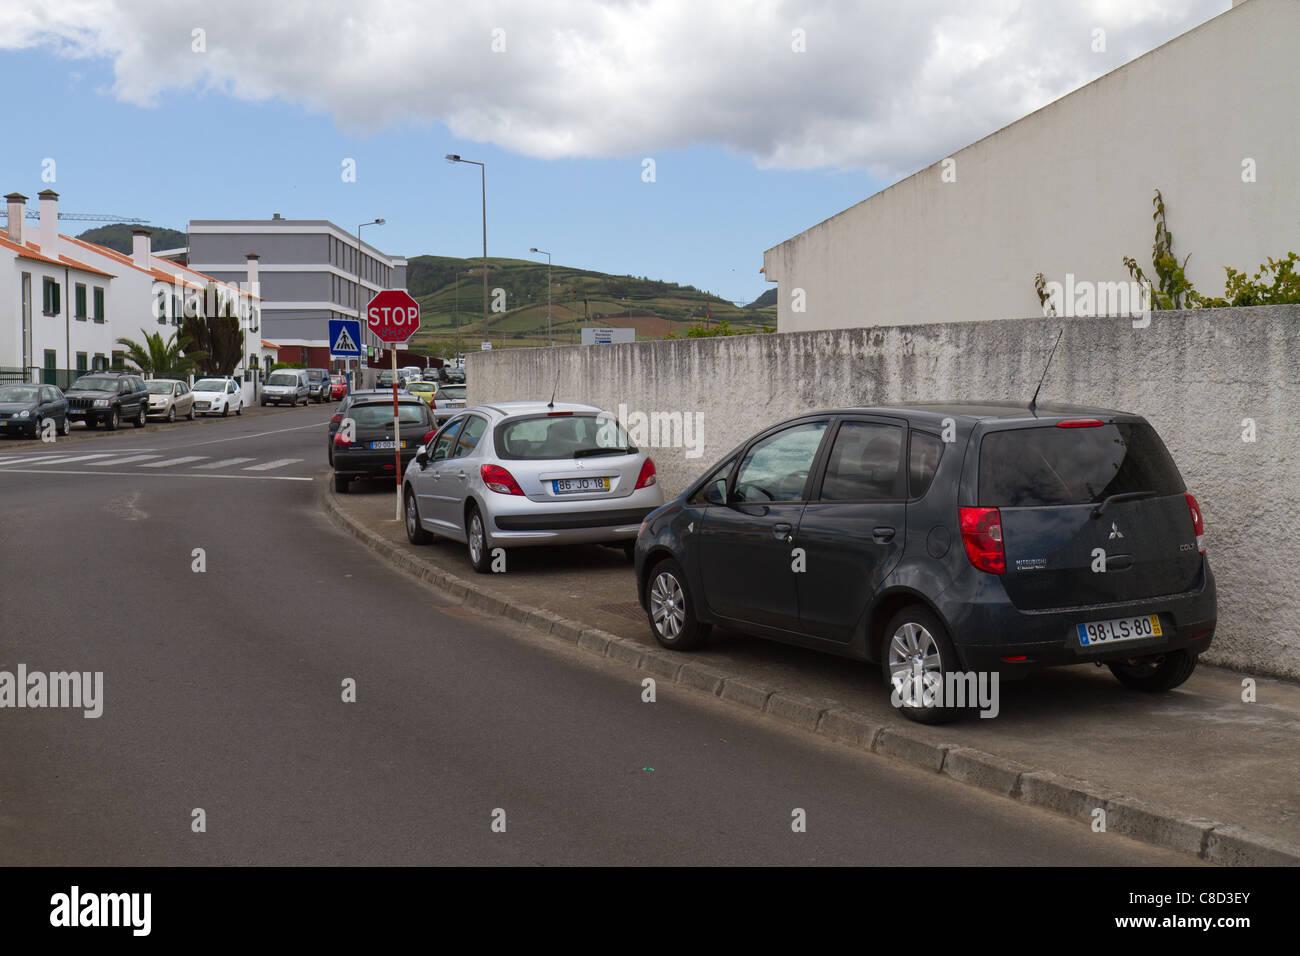 Cars parked on the sidewalk  Ribeira Grande, São Miguel island, Azores. - Stock Image